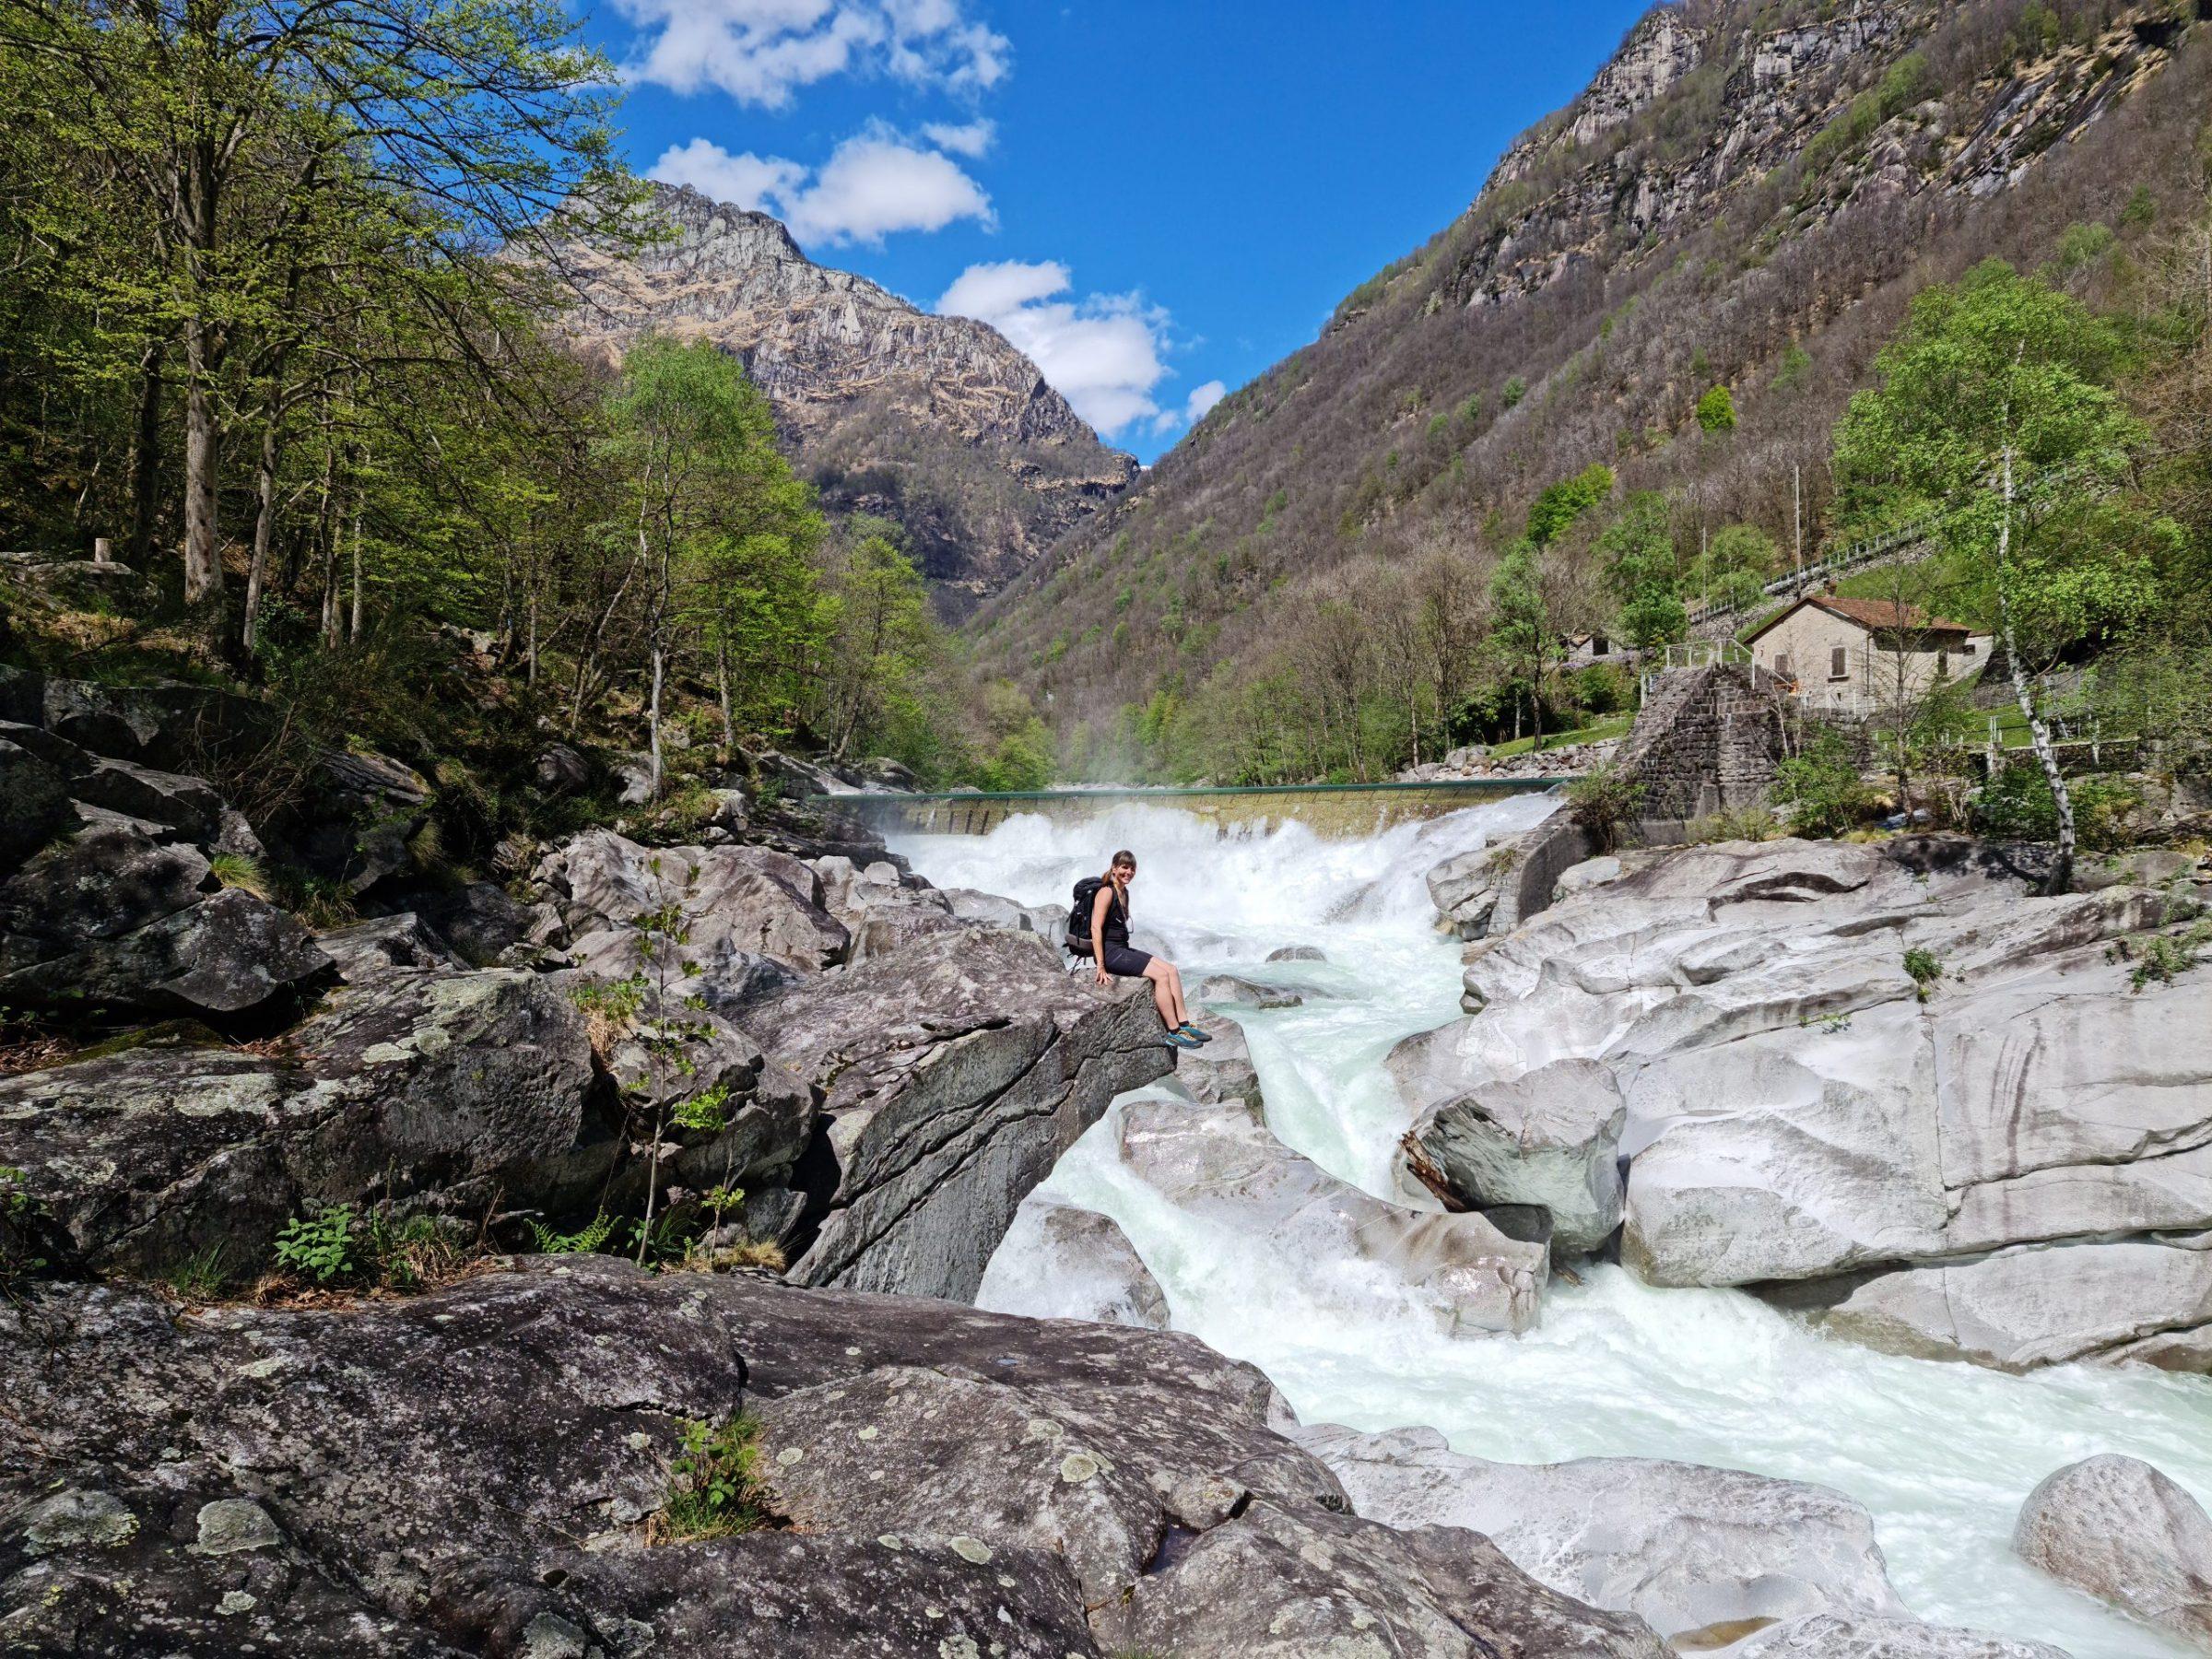 Meltwater rushing downstream